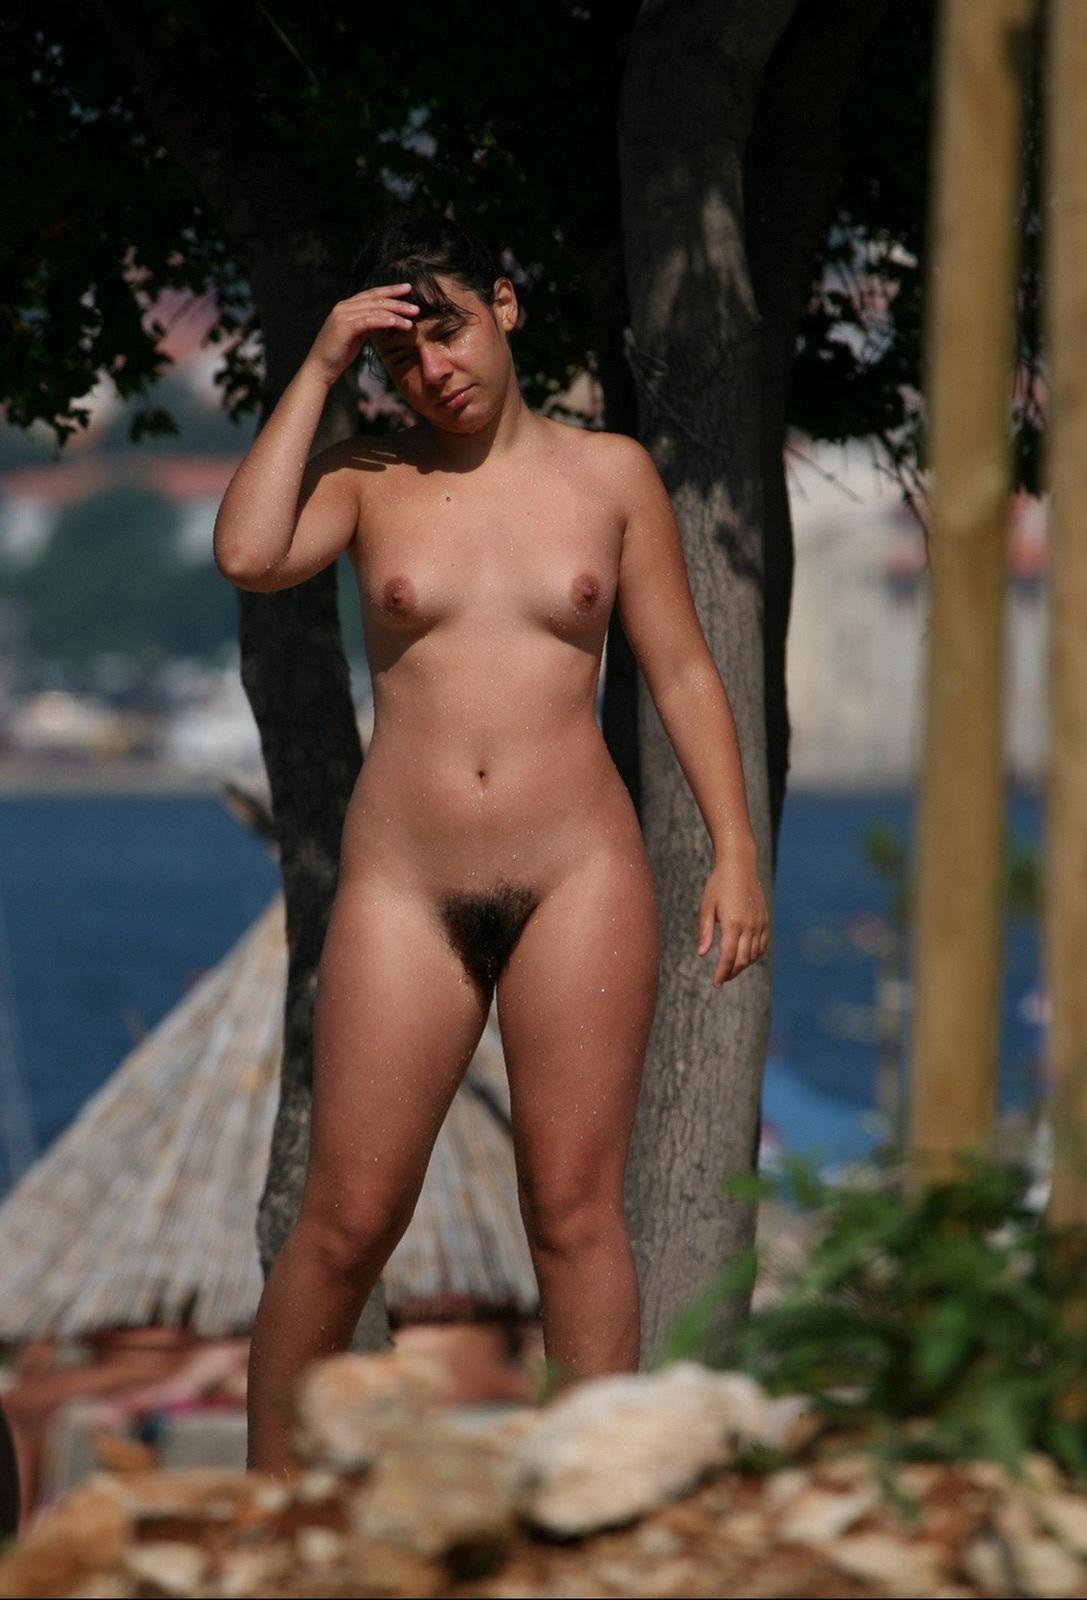 Nudist women with hair